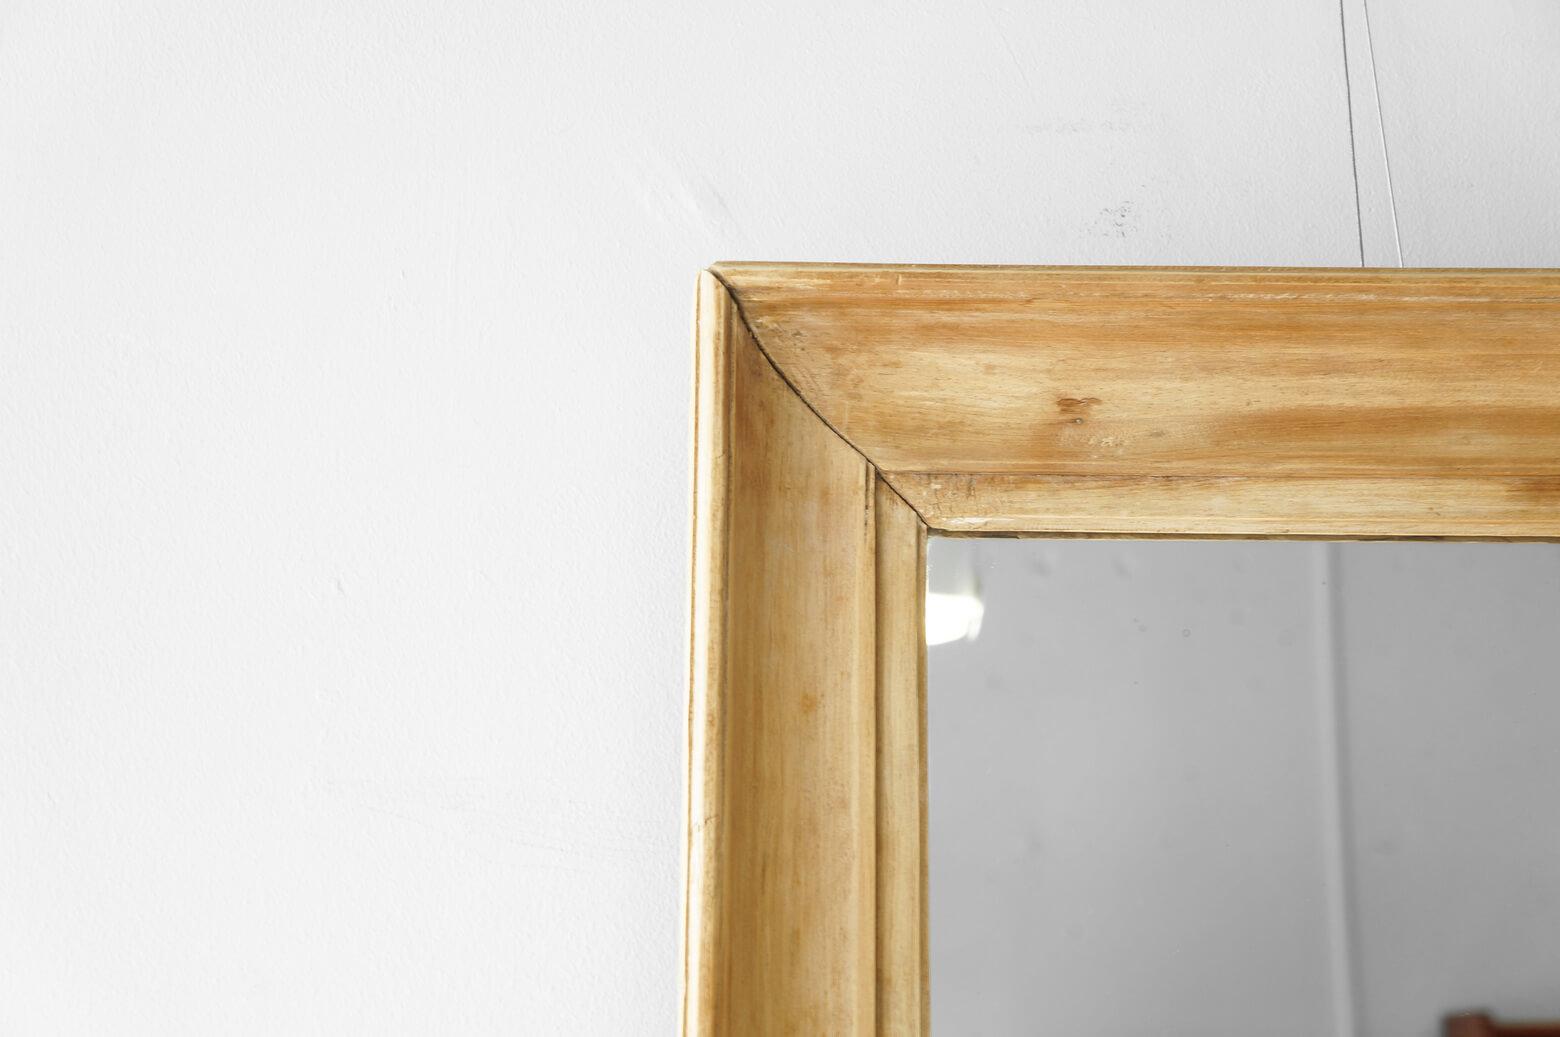 OLD PINE WOOD FLAME ANTIQUE WALL MIRROR LARGE / アンティーク ミラー パイン材 壁掛け 鏡 ラージ